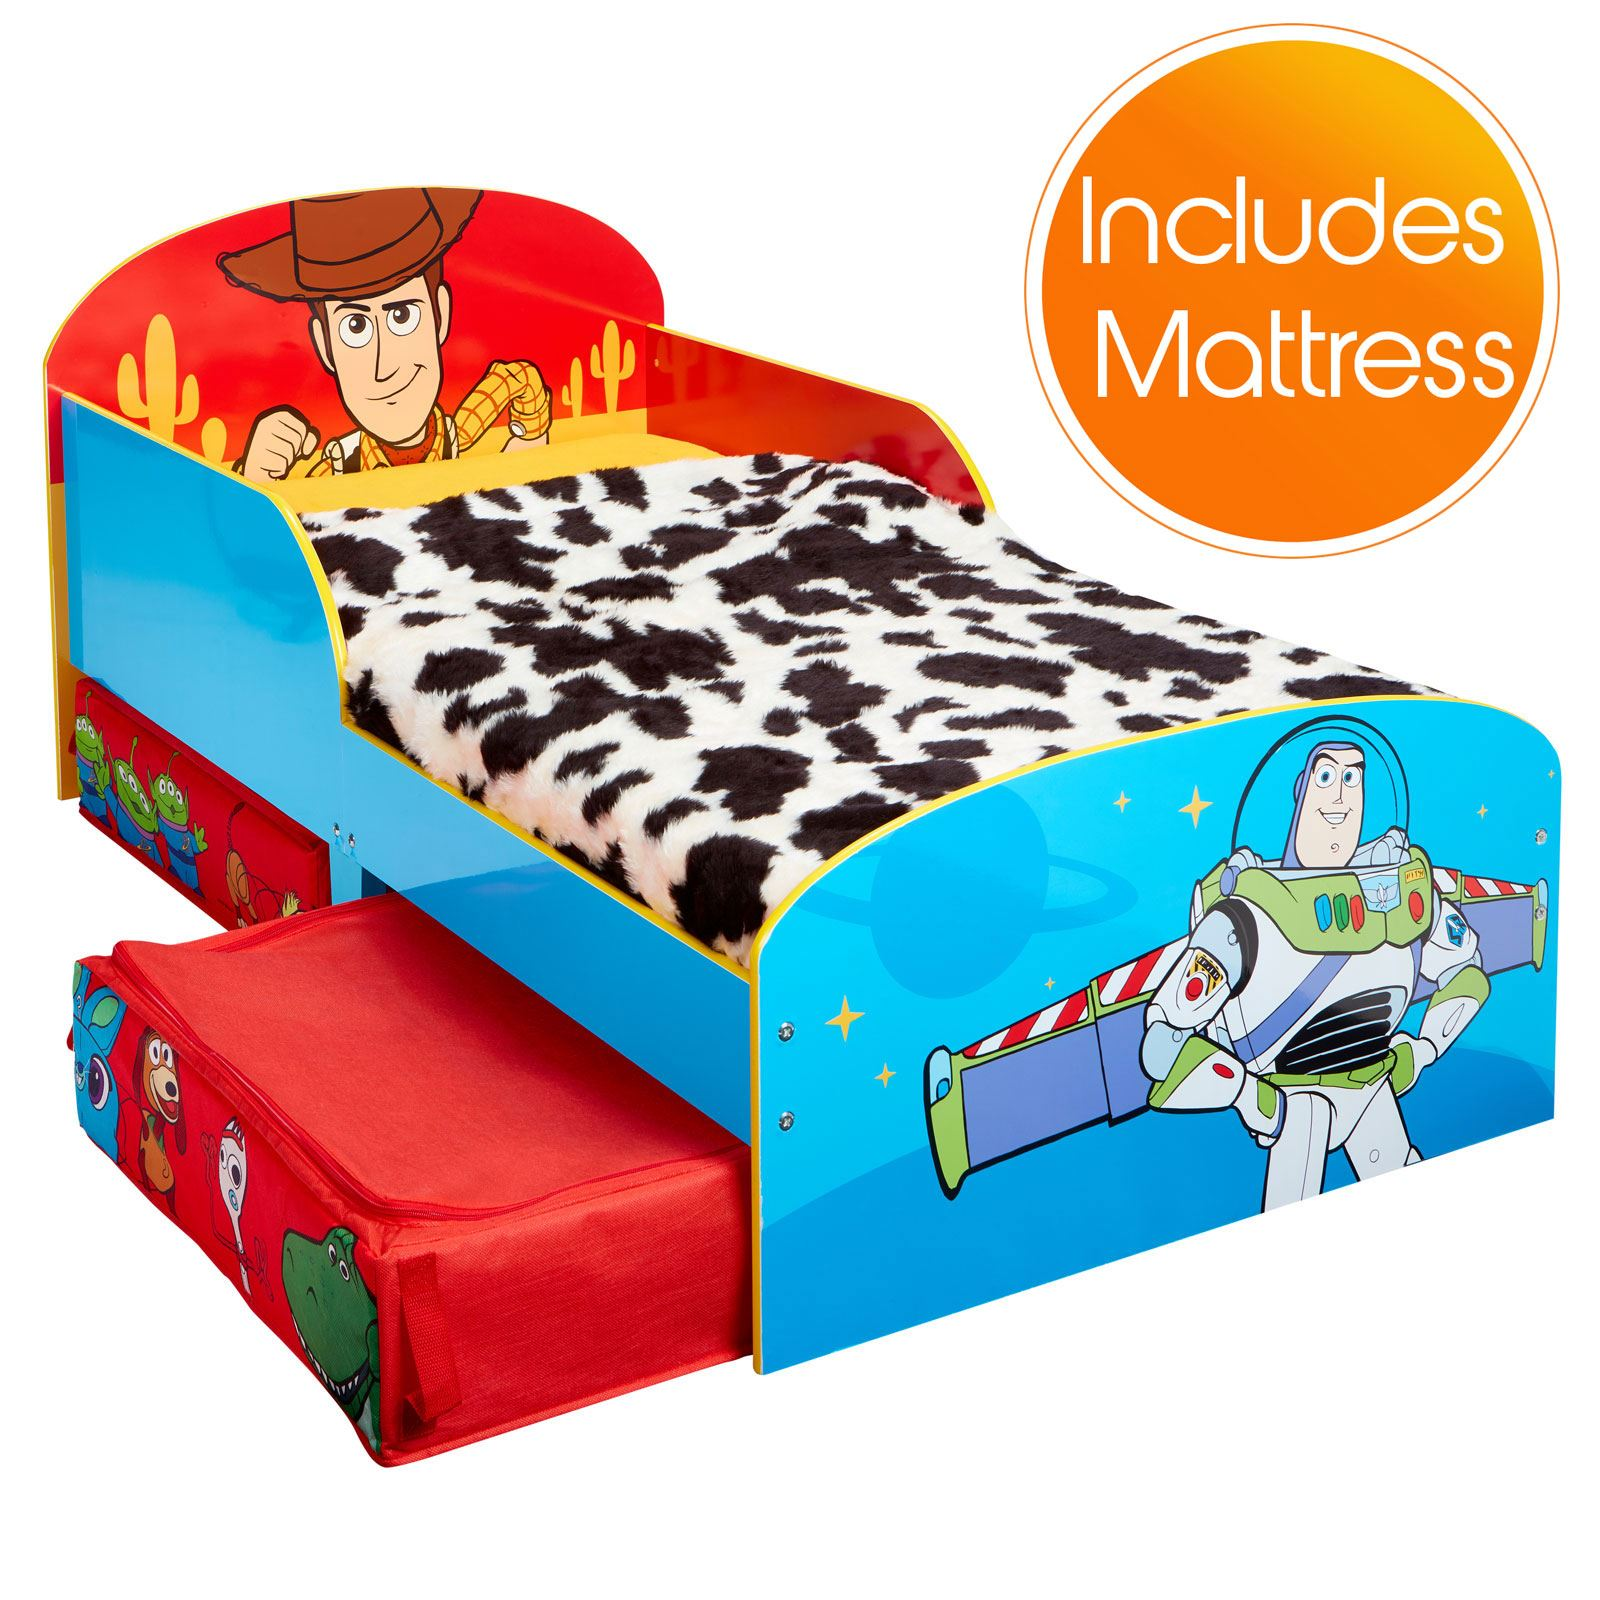 Matelas en mousse Toy story 4 enfant lit avec rangement enfants GLOW IN THE DARK